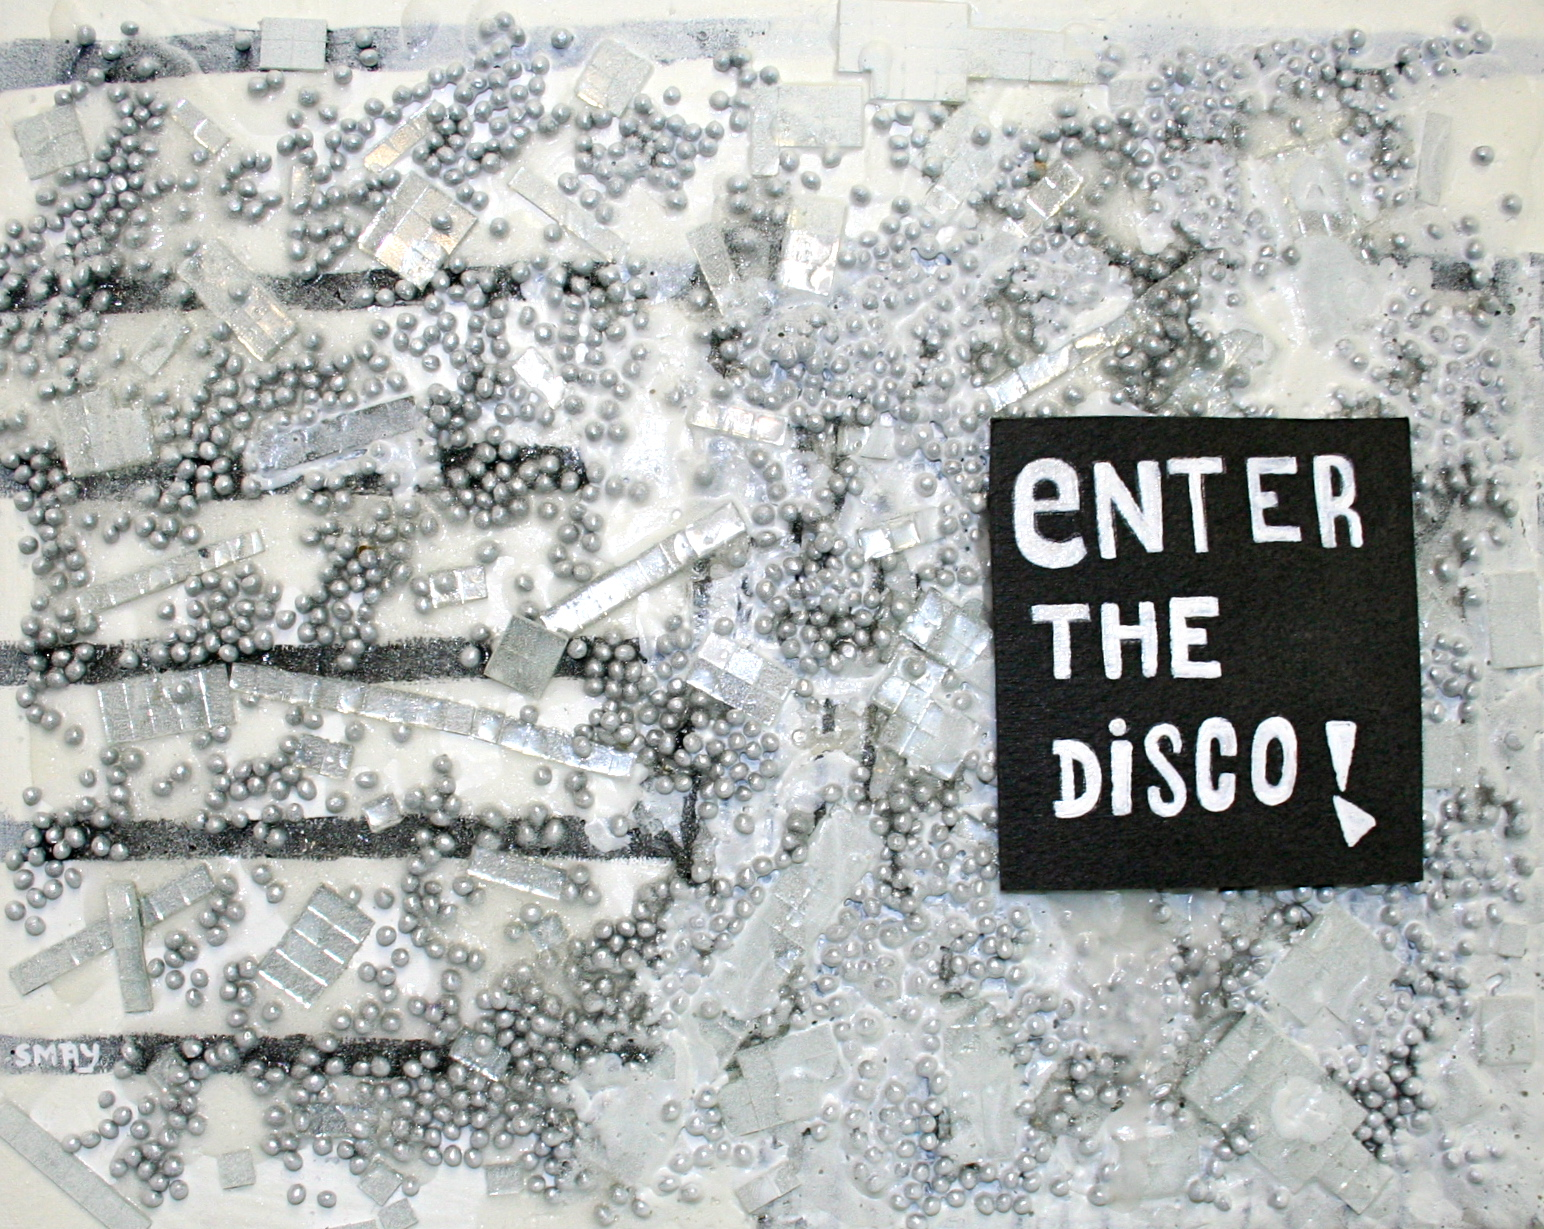 ENTER THE DISCO  2012 Mixed media on canvas   30 x 24cm